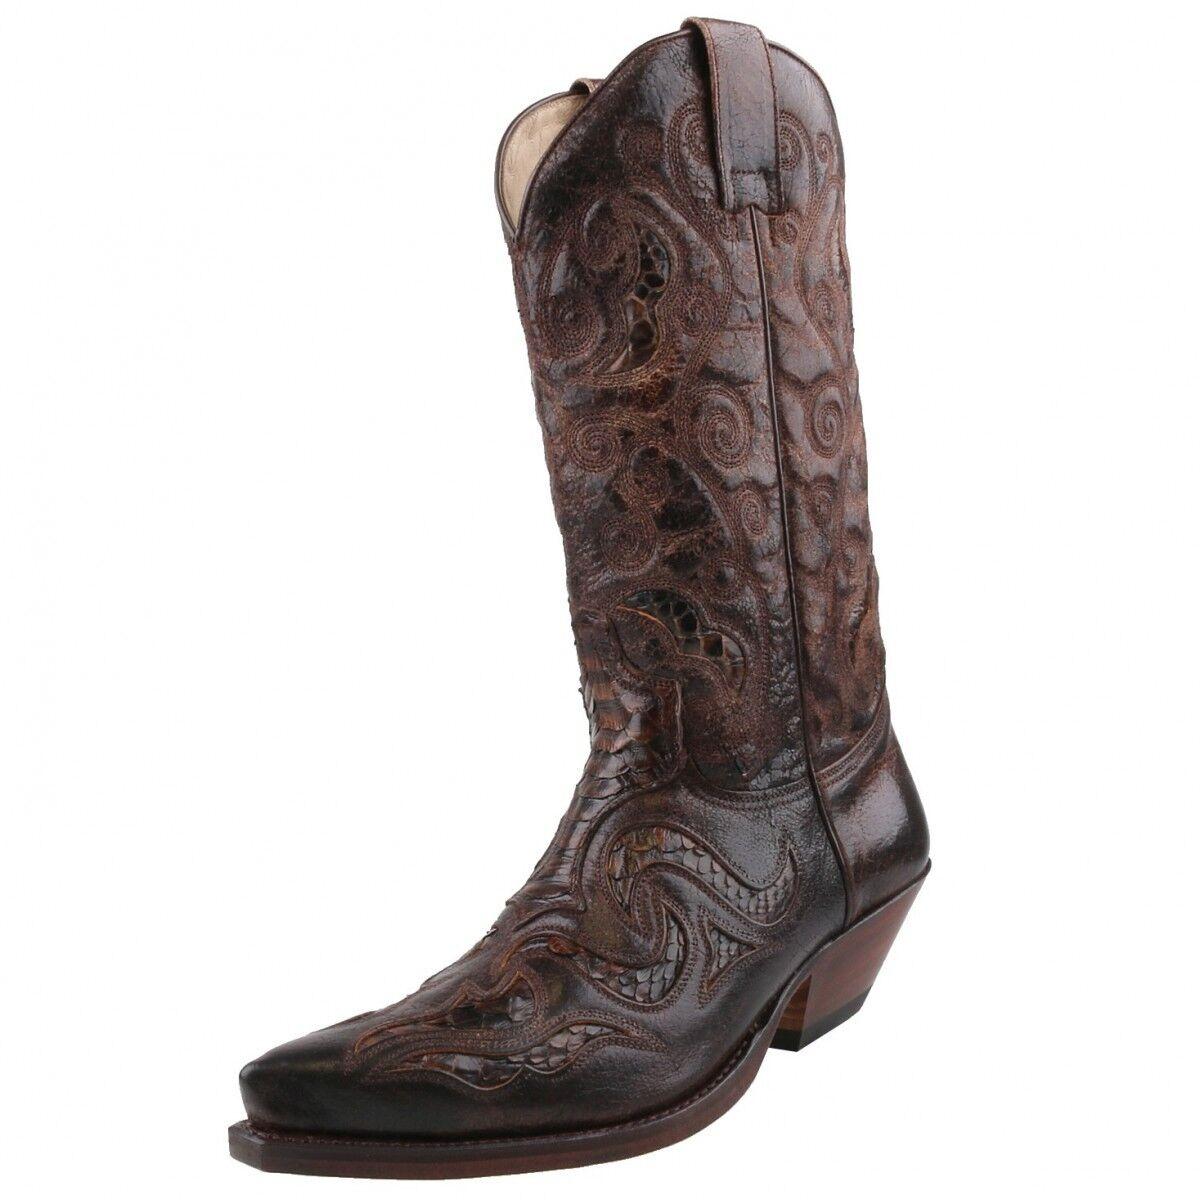 NUOVO Sendra stivali Stivali Cowboy Stivali Python 7428 Marroneee